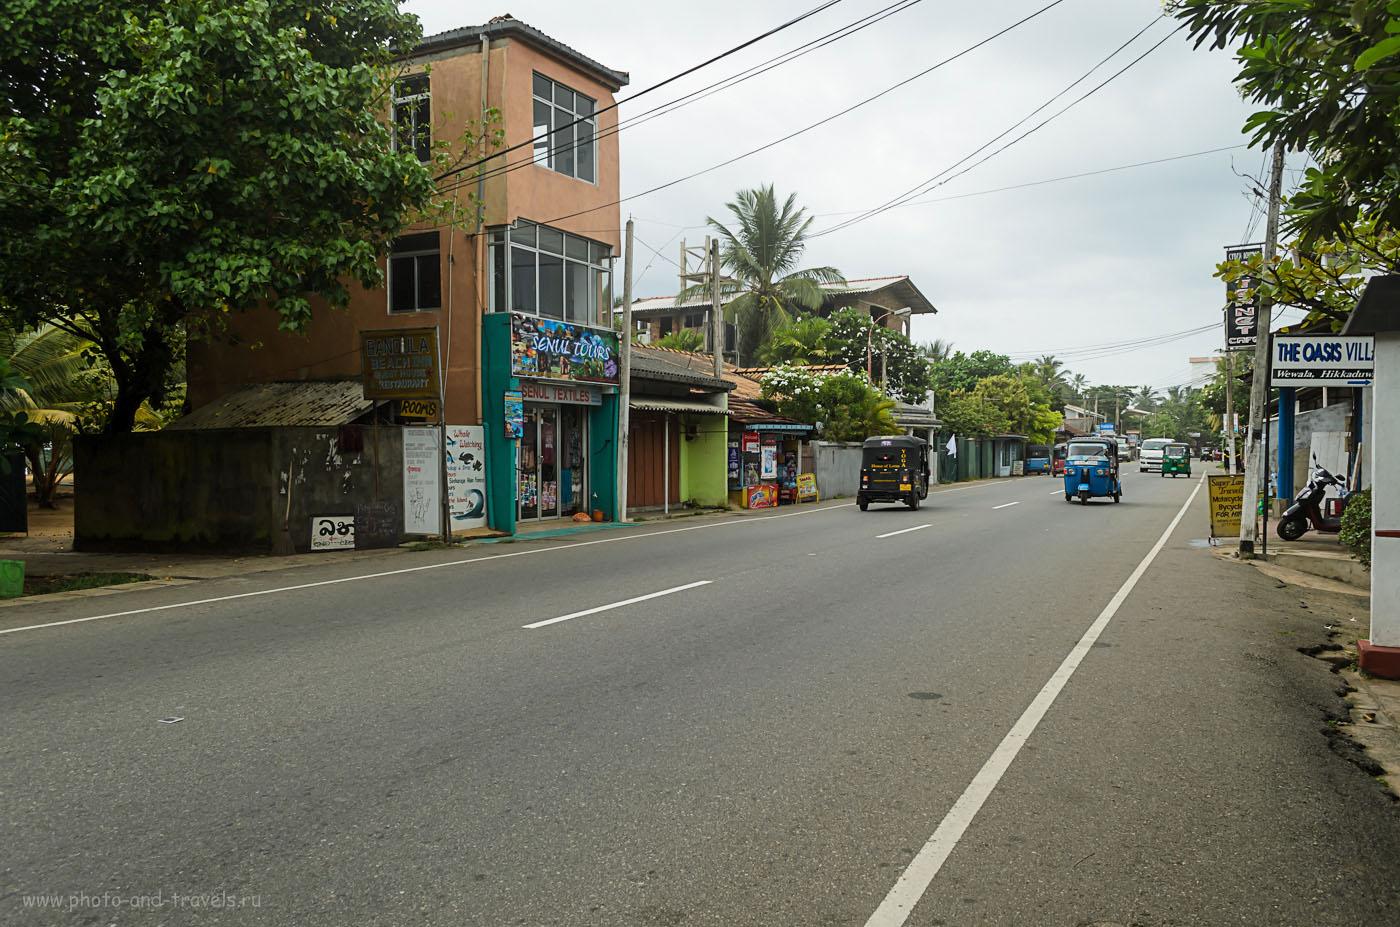 Фото 1. Шри-Ланка. Отдых в мае. На улочках курорта Хиккадува (Hikkaduwa).